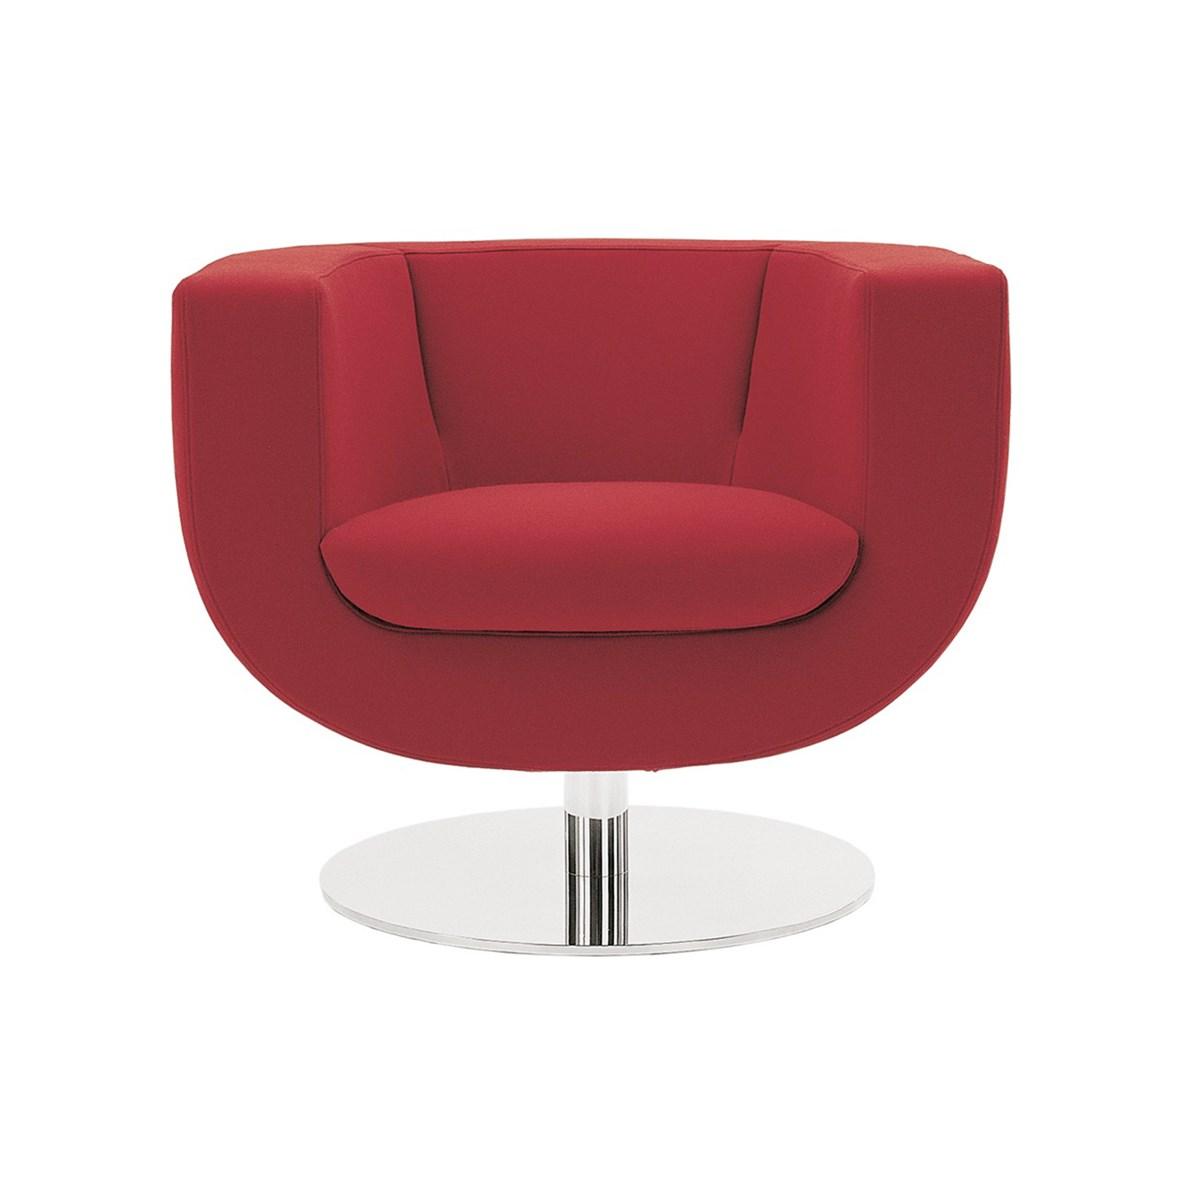 B&B-Italia-Jeffrey-Bernett-Tulip-Armchair-Matisse-1